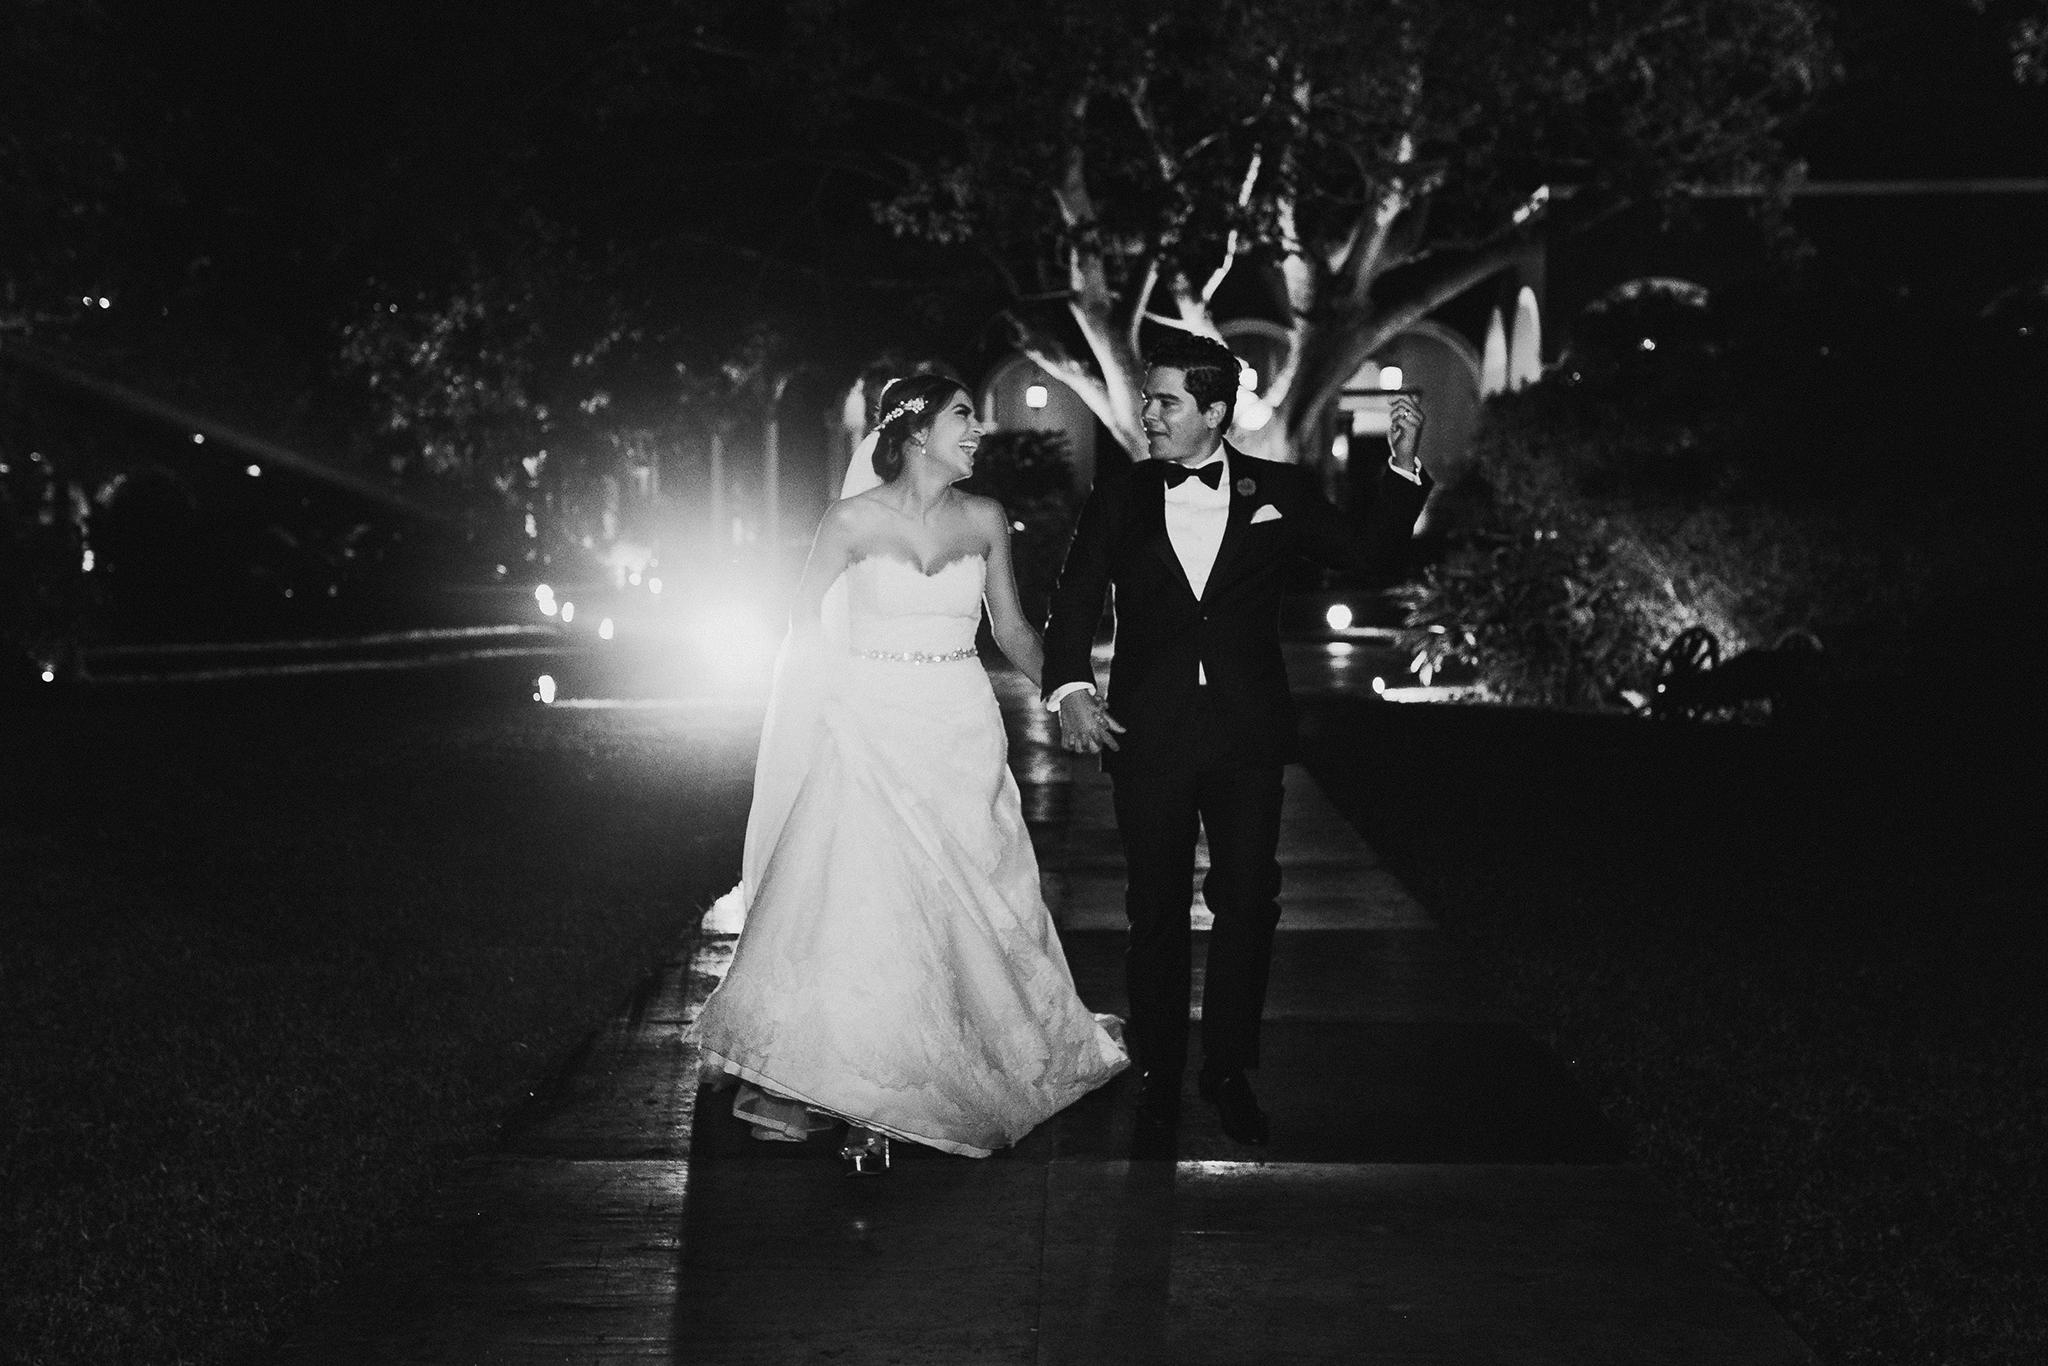 0282F&Yslide_WeddingDstination_MeridaYucatan_HaciendasMerida_BodasMexico_BodasYucatan_Boda_Destino.jpg